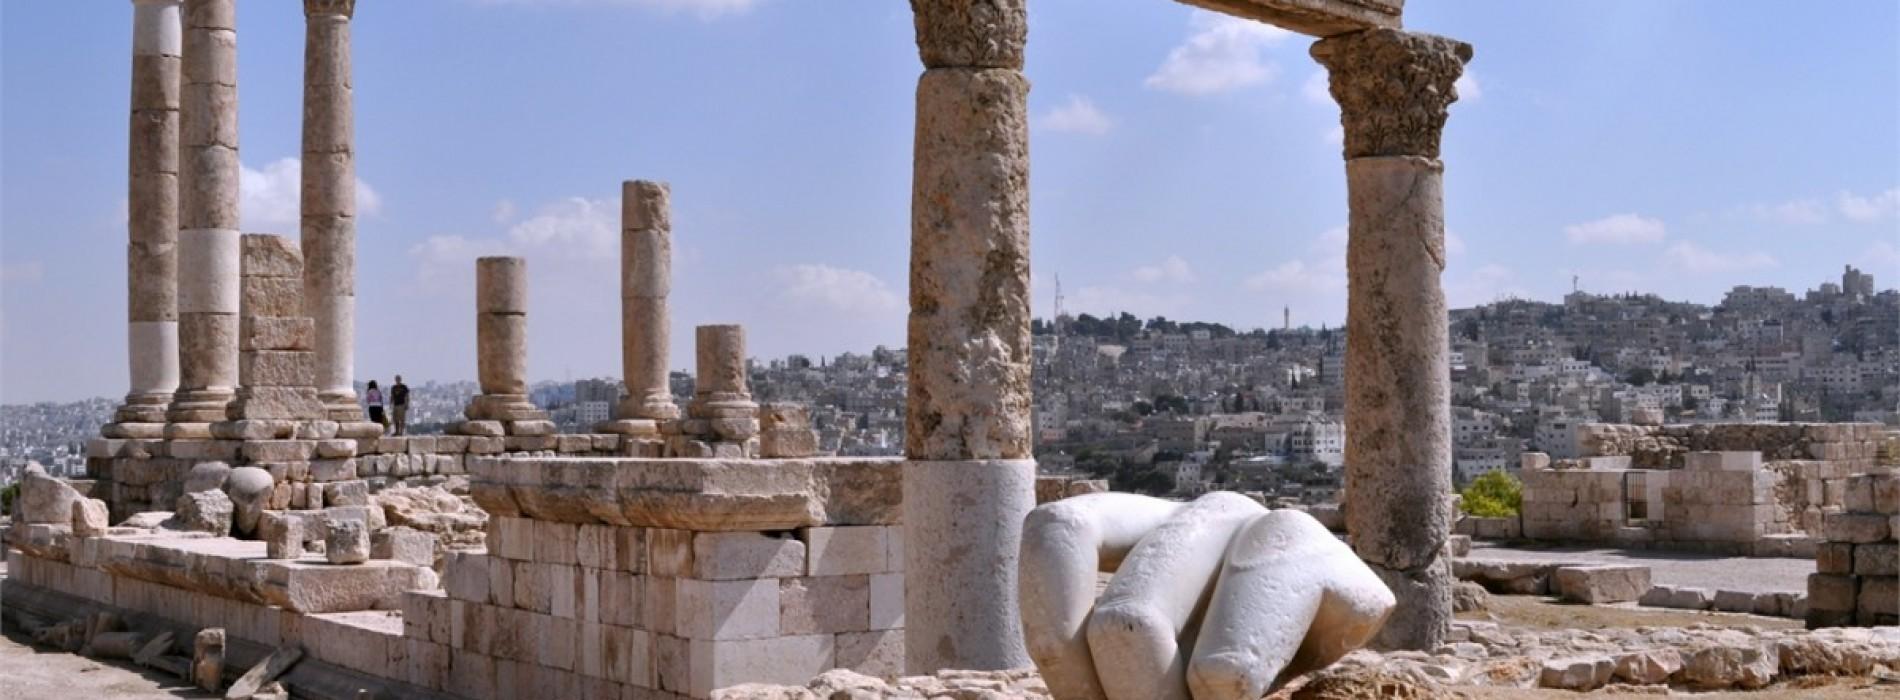 Jordan Tourism Board issues public statement for tourists